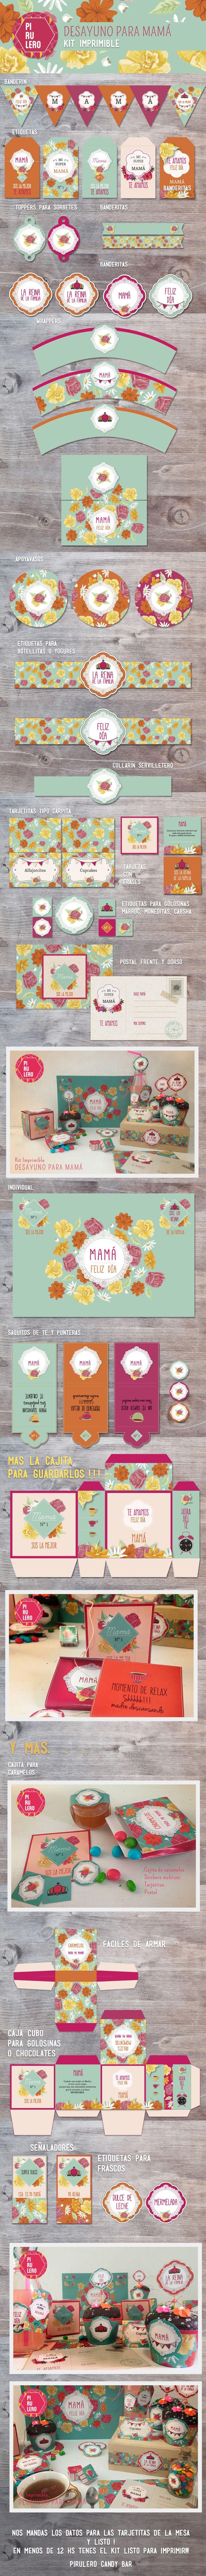 Dia de la madre - desayuno - kit imprimible